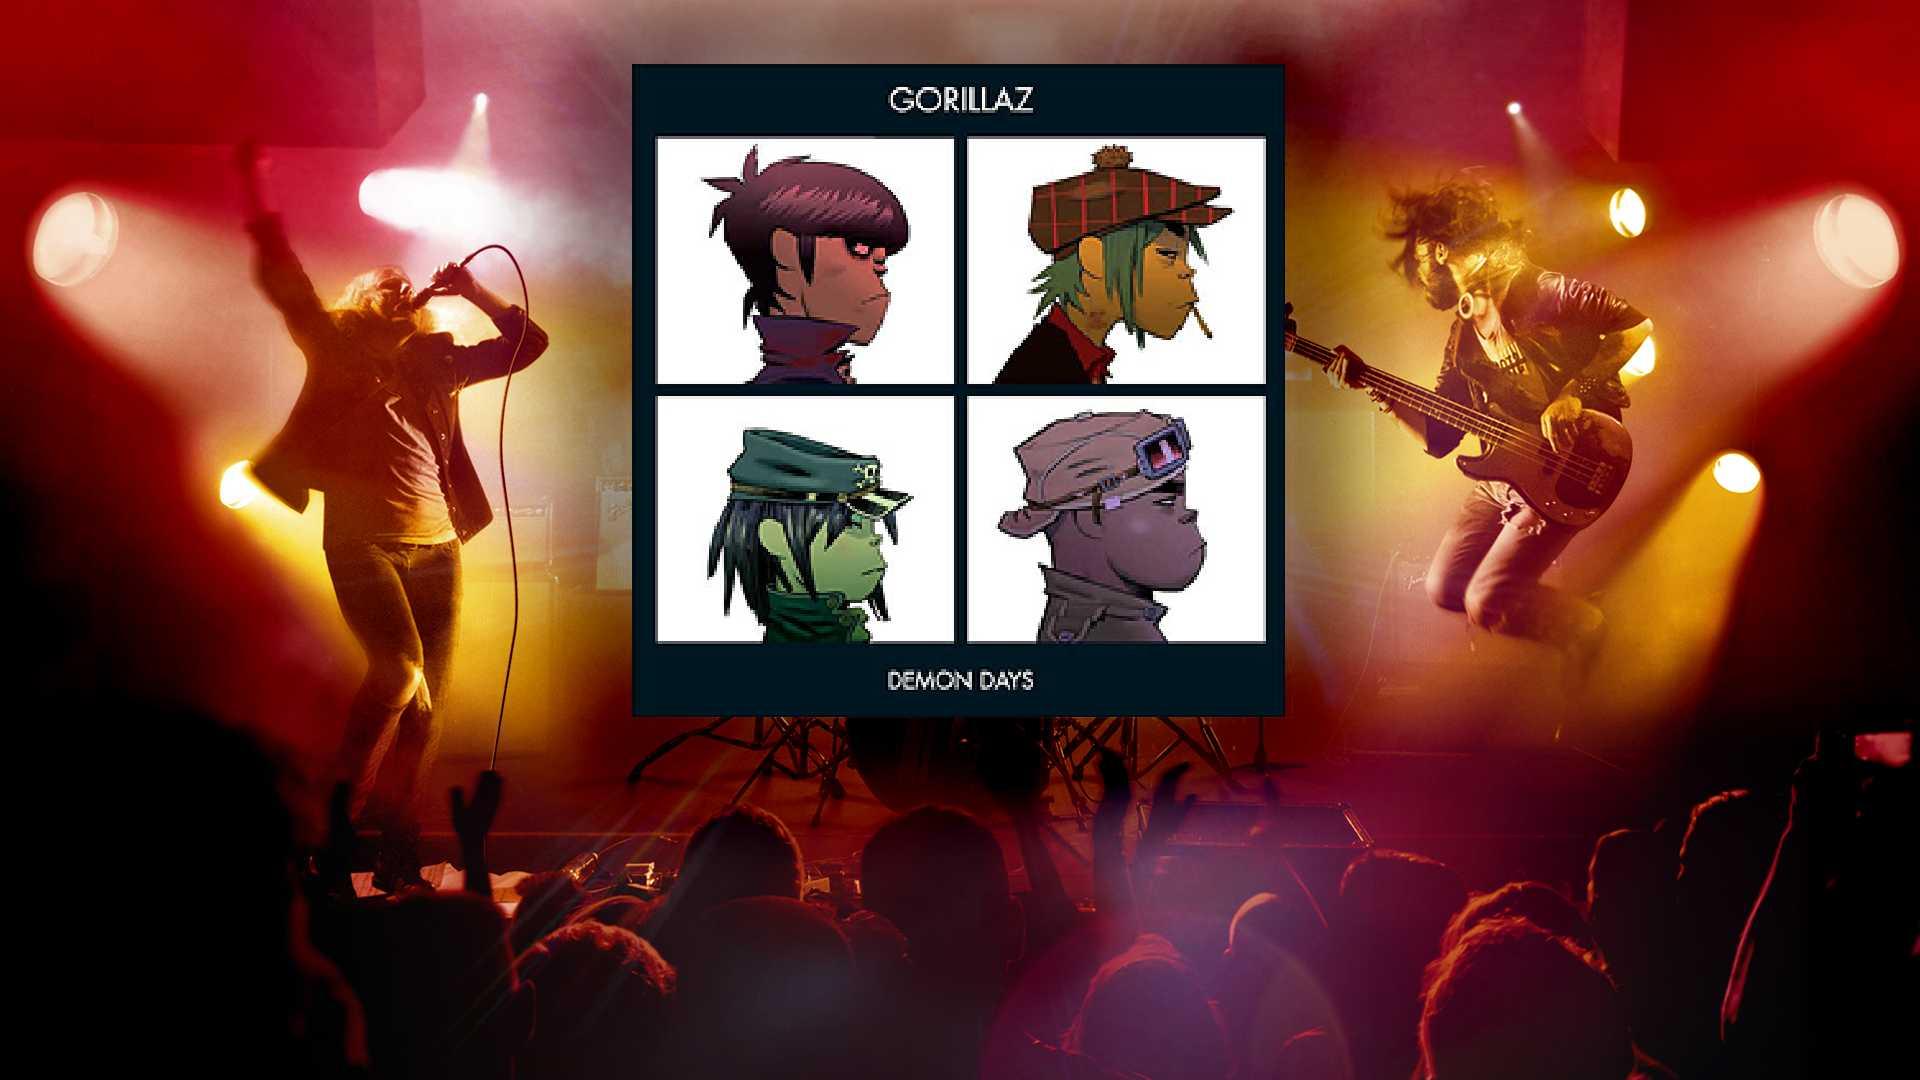 Buy Feel Good Inc Gorillaz Xbox Store Checker